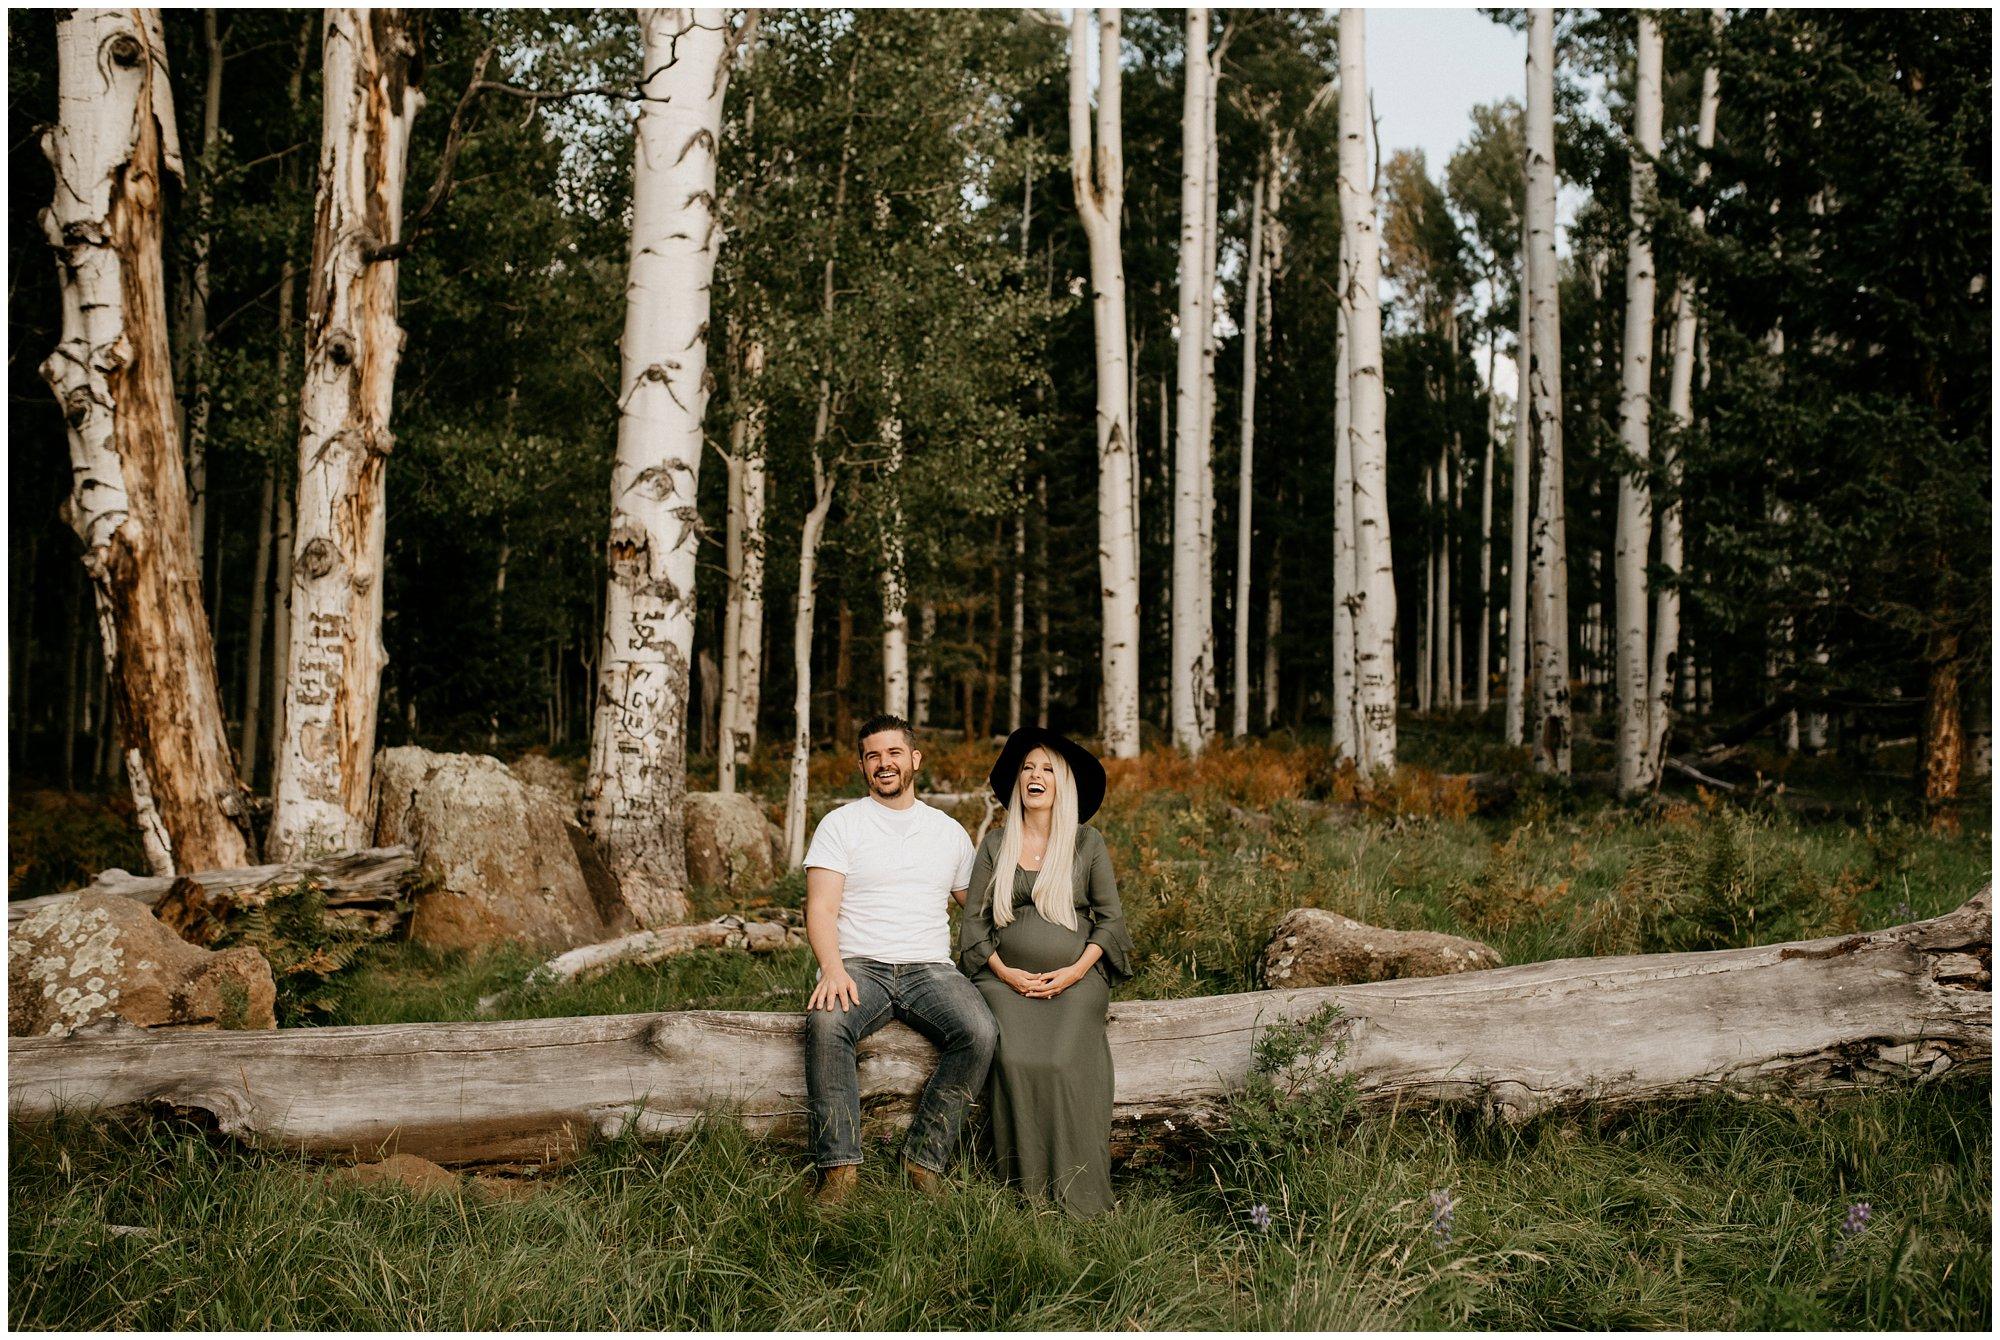 Flagstaff Aspen Tree Portrait Session - Gabby + Gary - Ashtyn Nicole Photo_0031.jpg